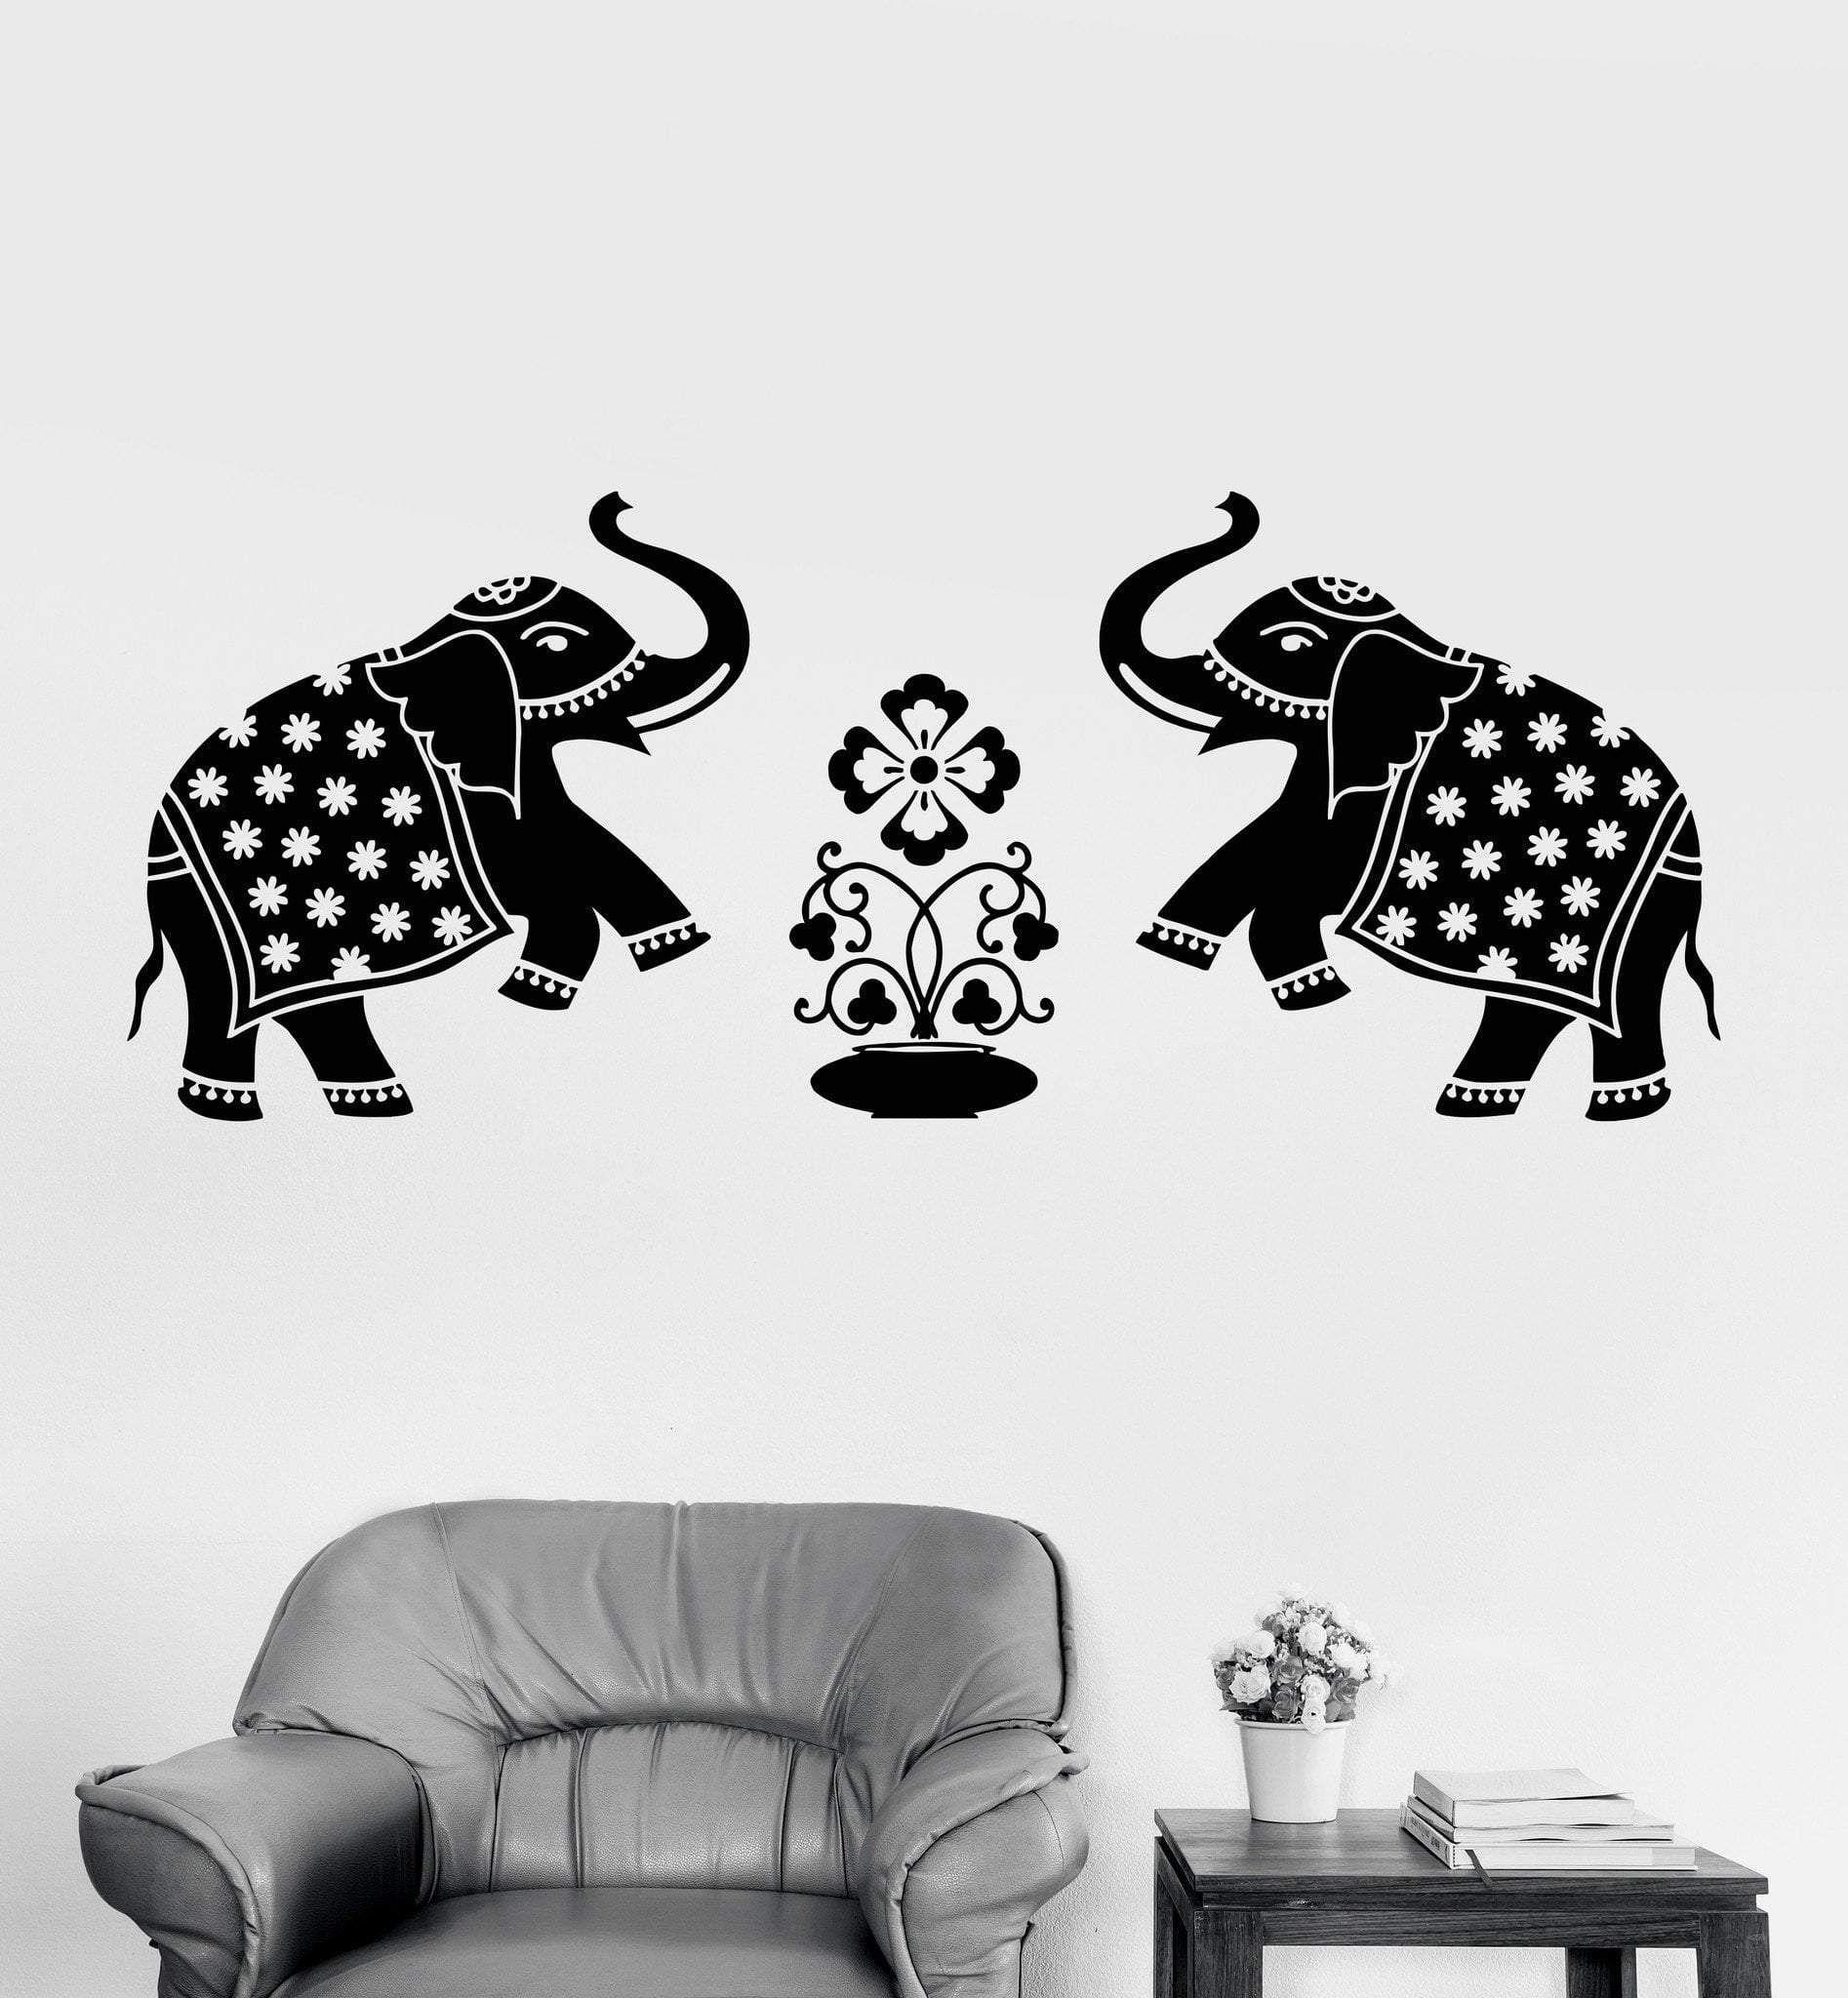 Vinyl Wall Decal Elephants India Animals Home Decoration Art